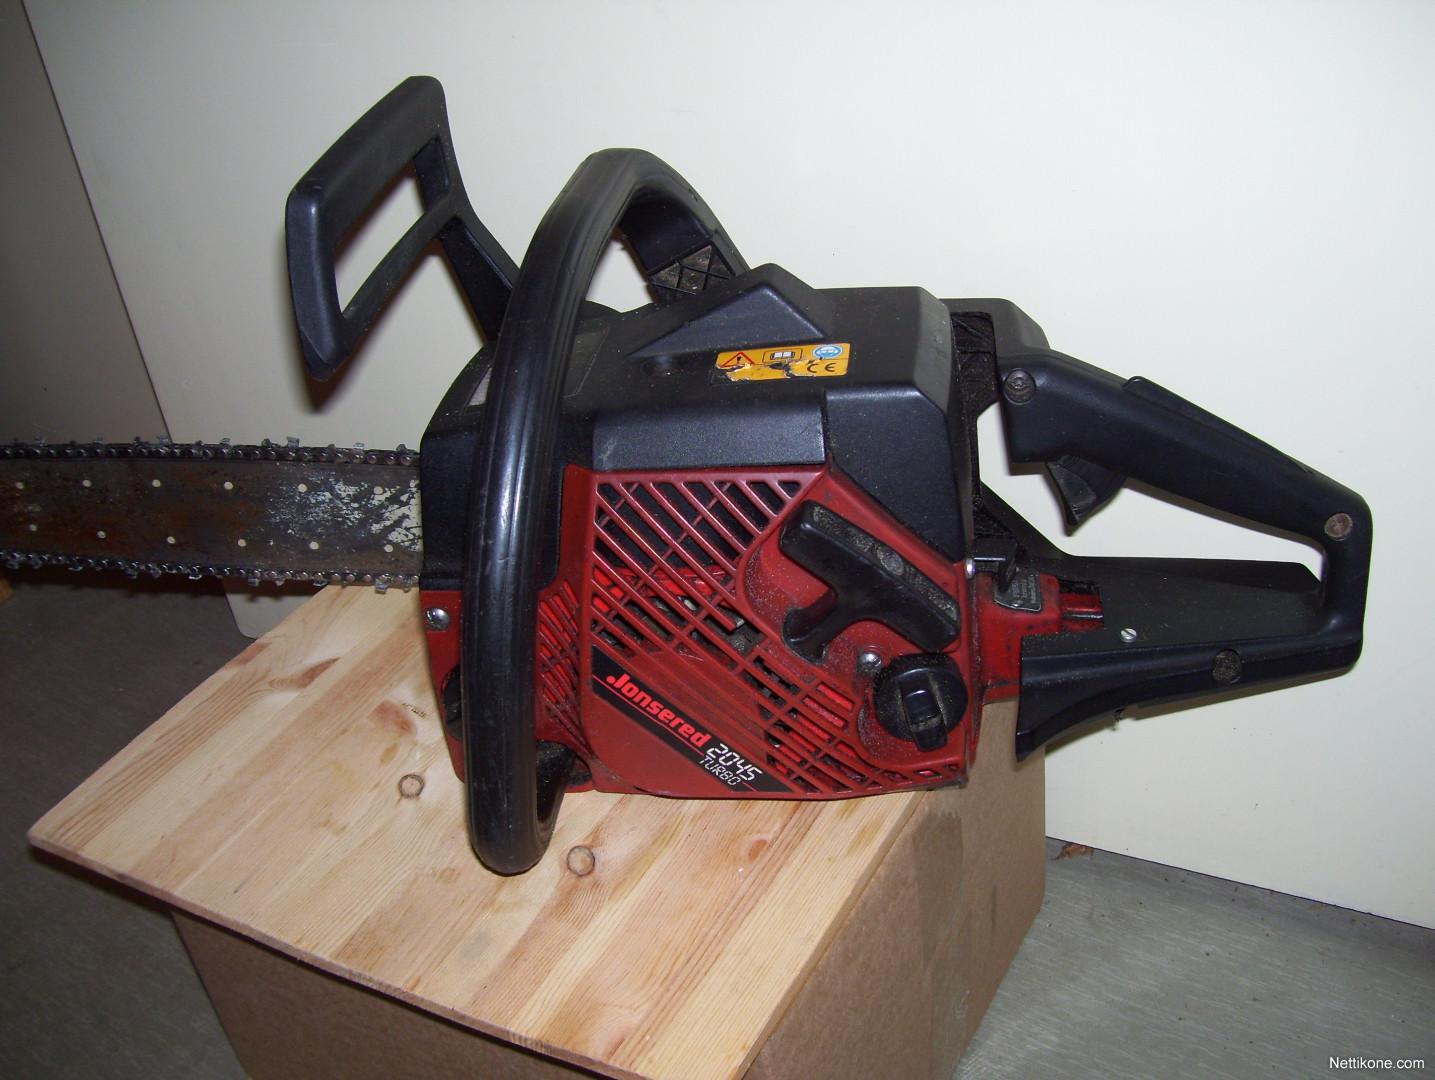 Jonsered 2045 turbo sawmills nettikone jonsered 2045 turbo keyboard keysfo Gallery